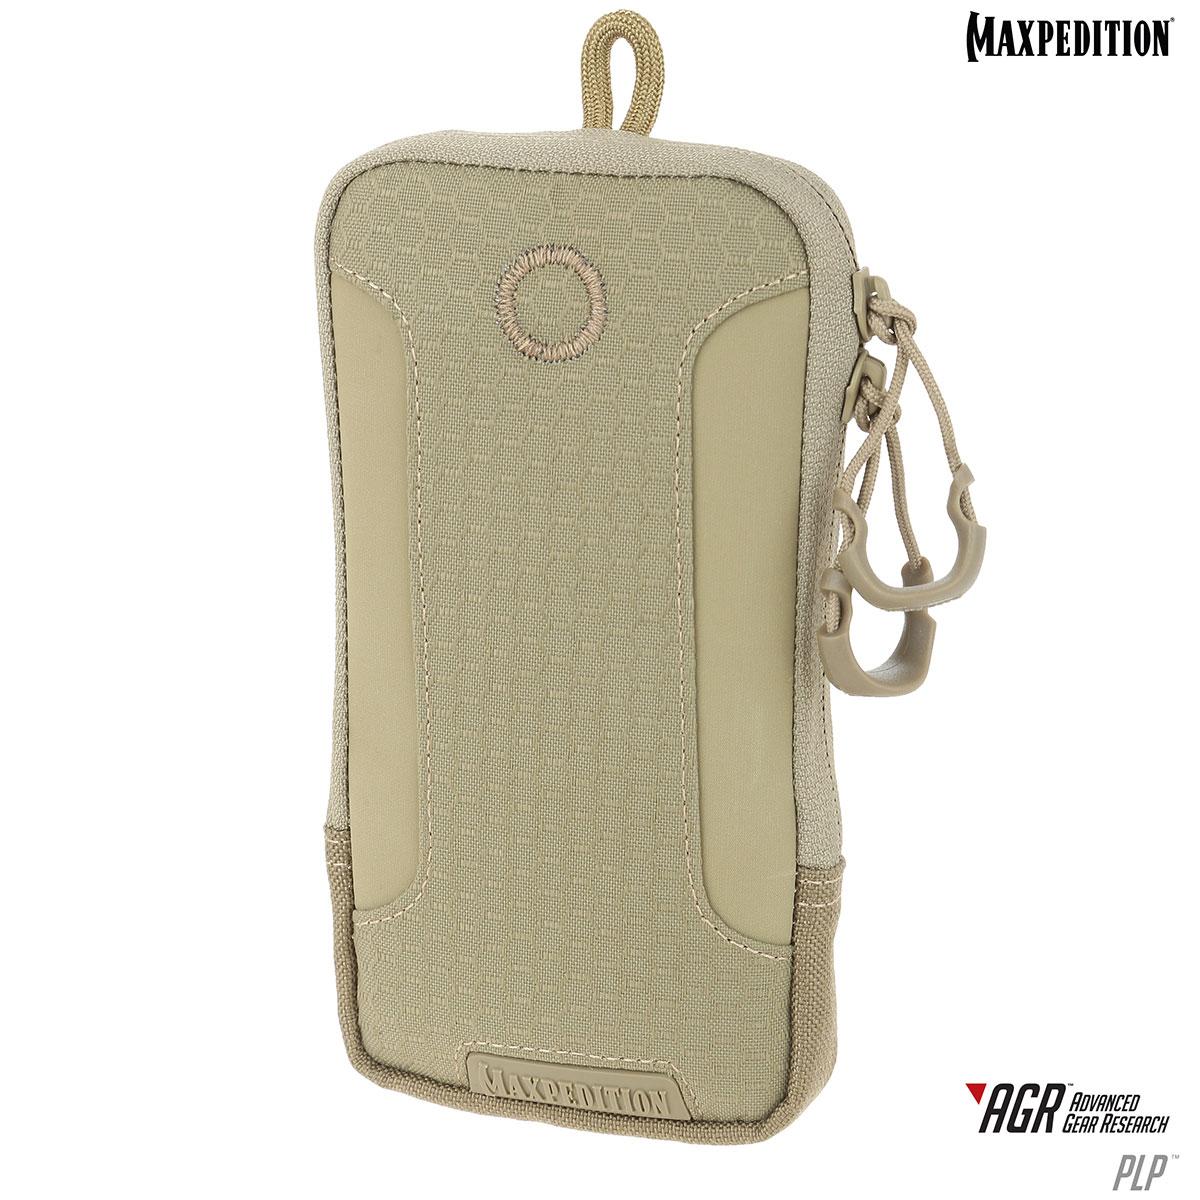 Maxpedition PLPTAN AGR Advanced Gear Research PLP iPhone 6s Plus Pouch, Tan